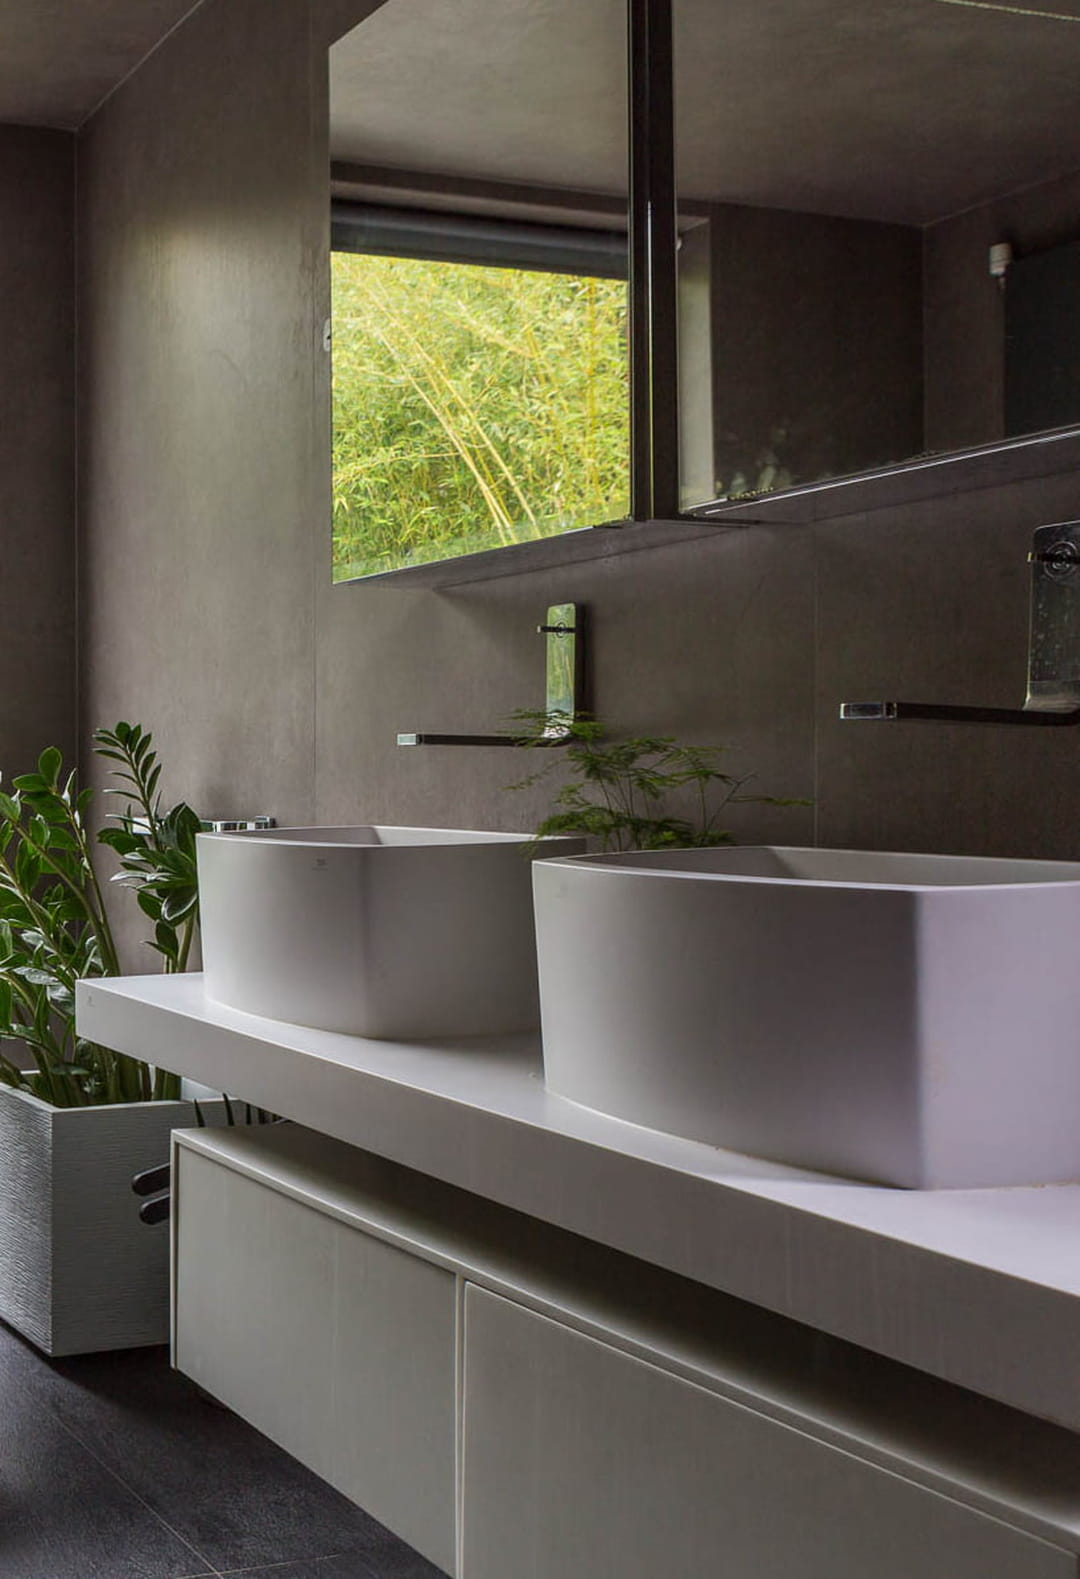 rangement-salle-de-bain-armoire-avec-miroir